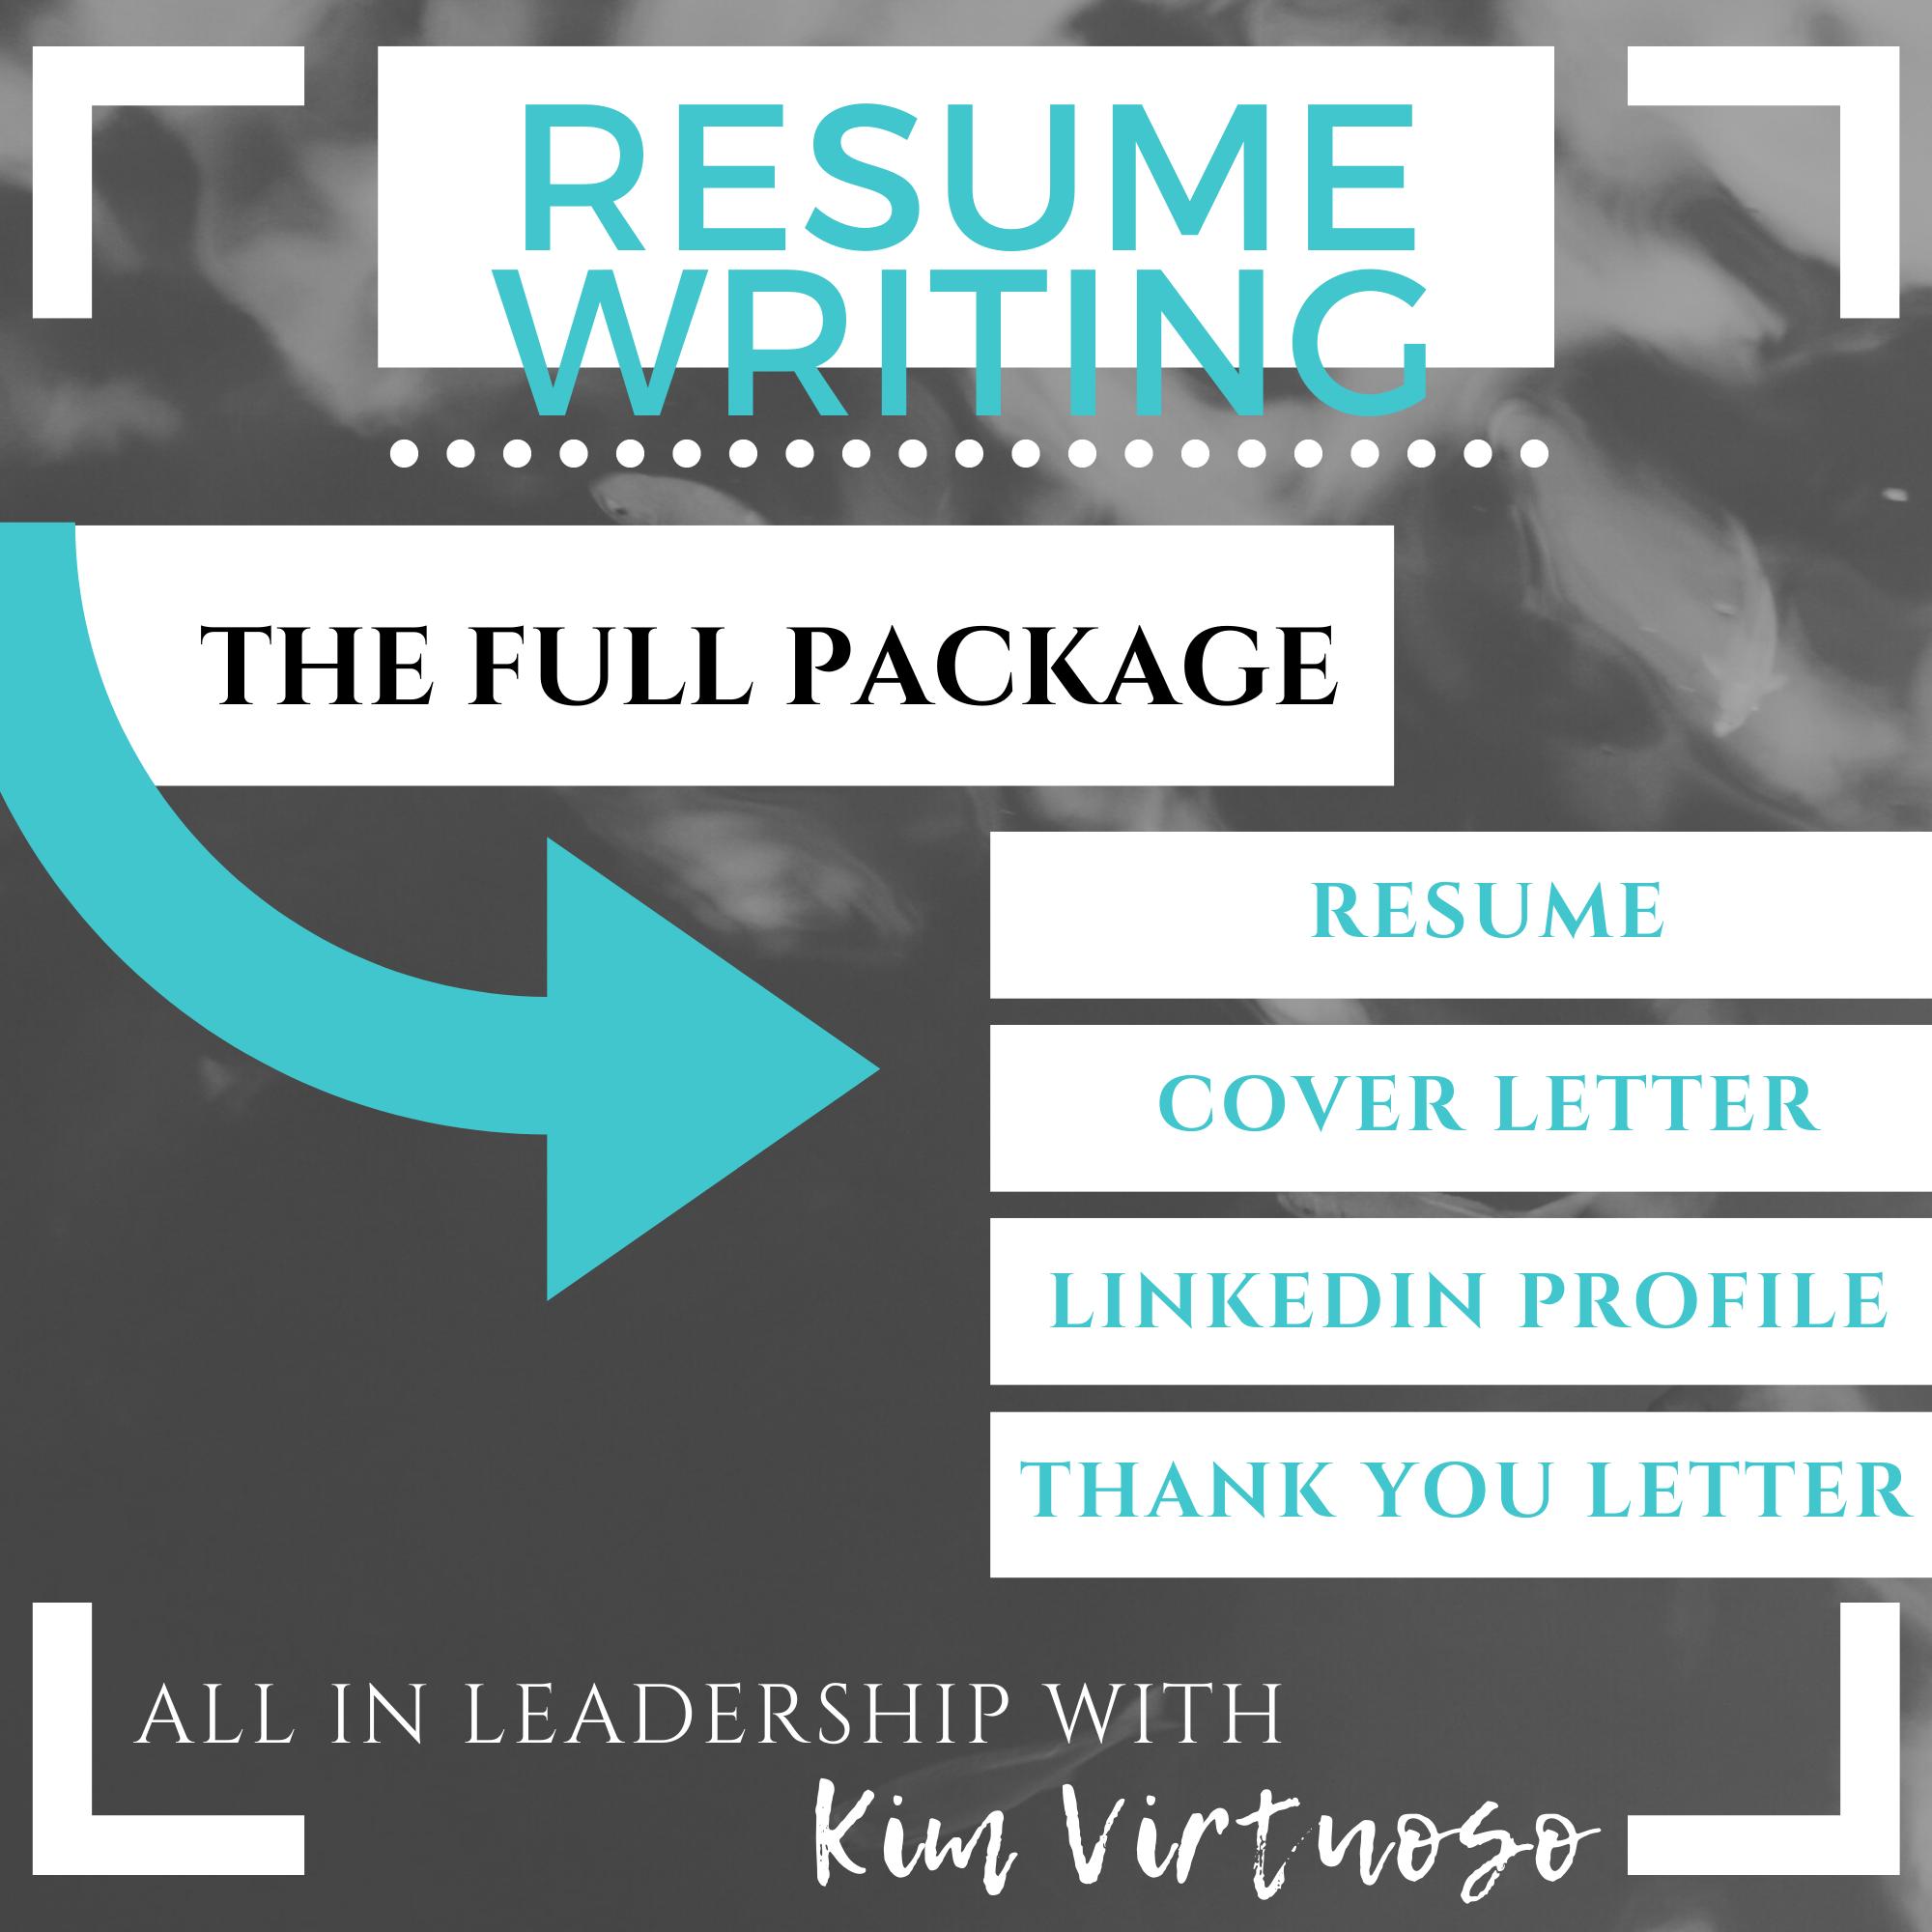 Resume Writing, Resume Writing Service, Resume Writer